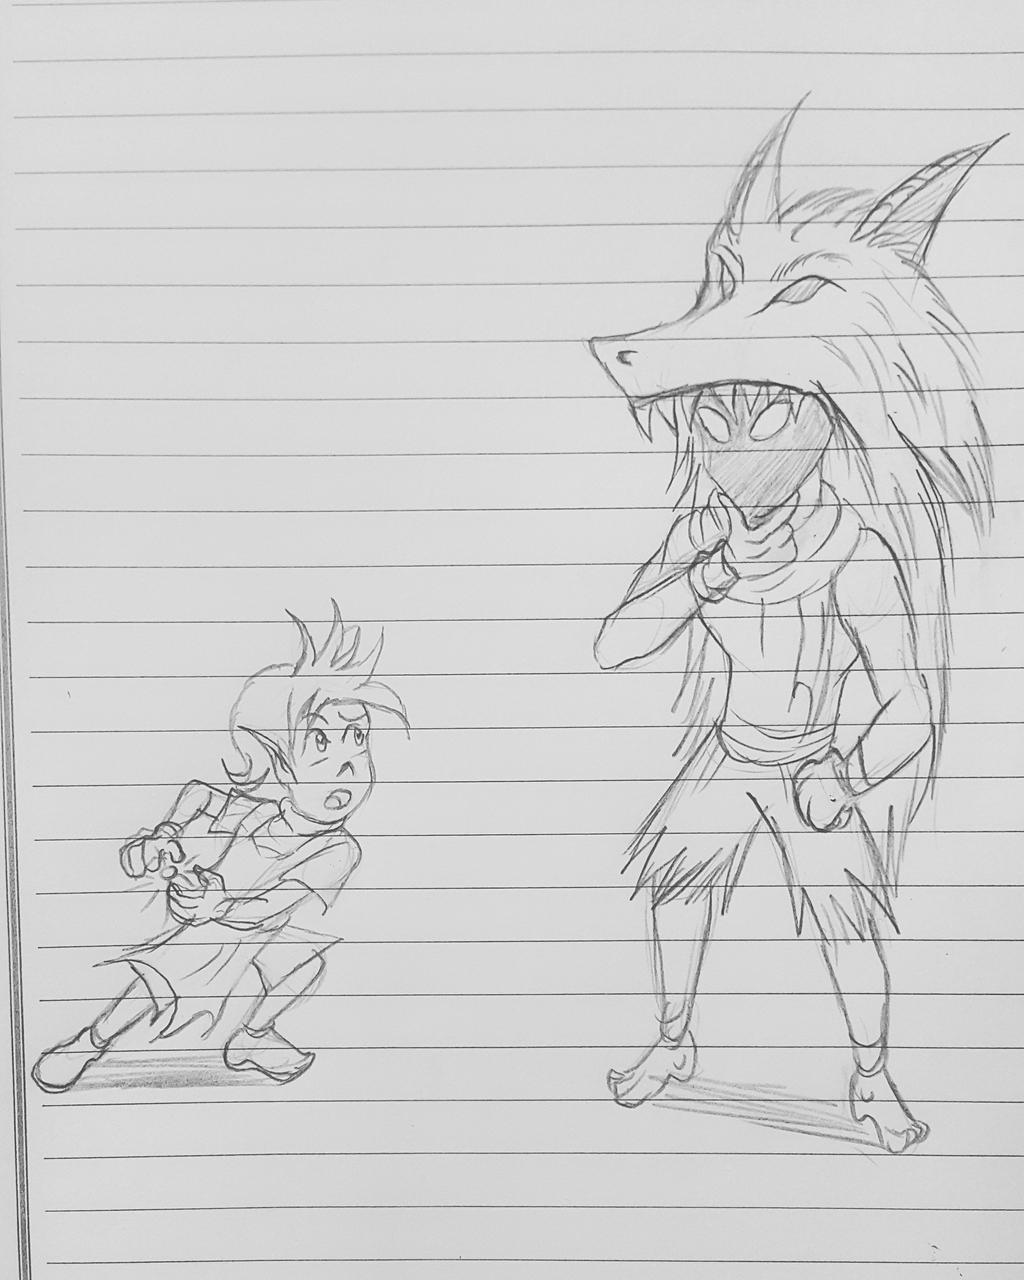 Carlo asked the Undying Spirit Warrior by ryuu-samazx